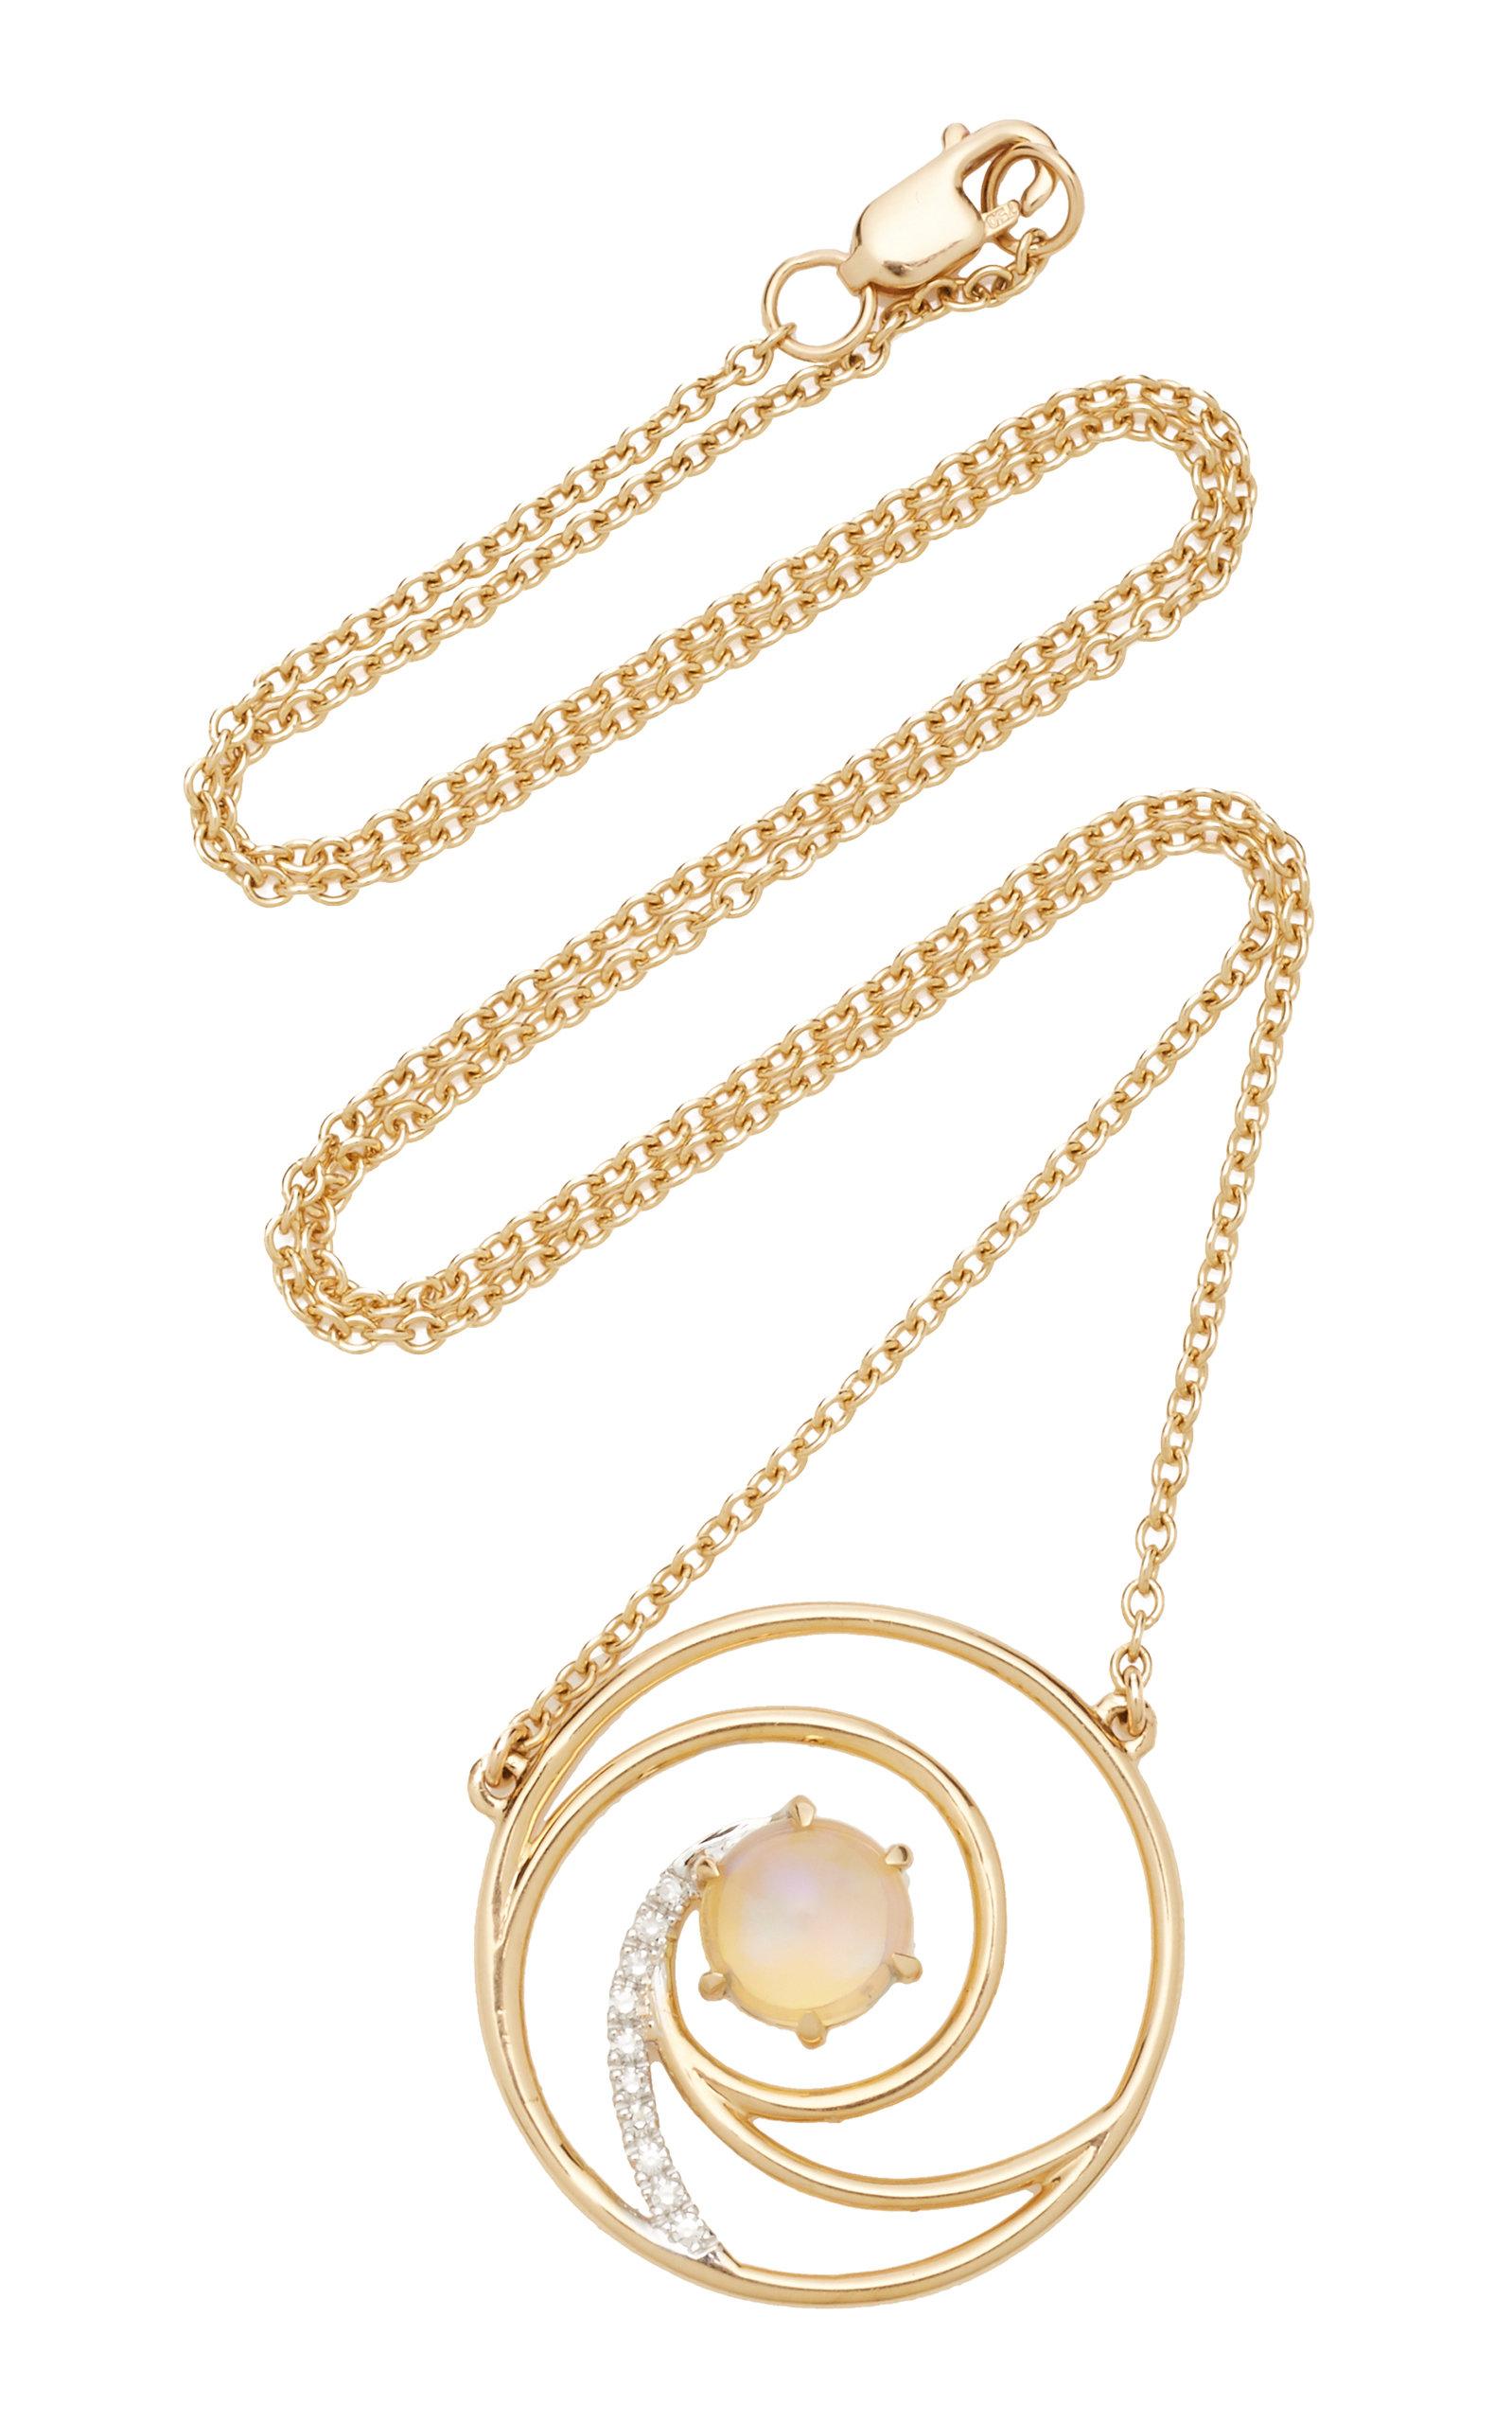 8d88a7791a6178 RENNA Lunasea Pendant in 2019 | Products | Pendants, Moda, Fashion